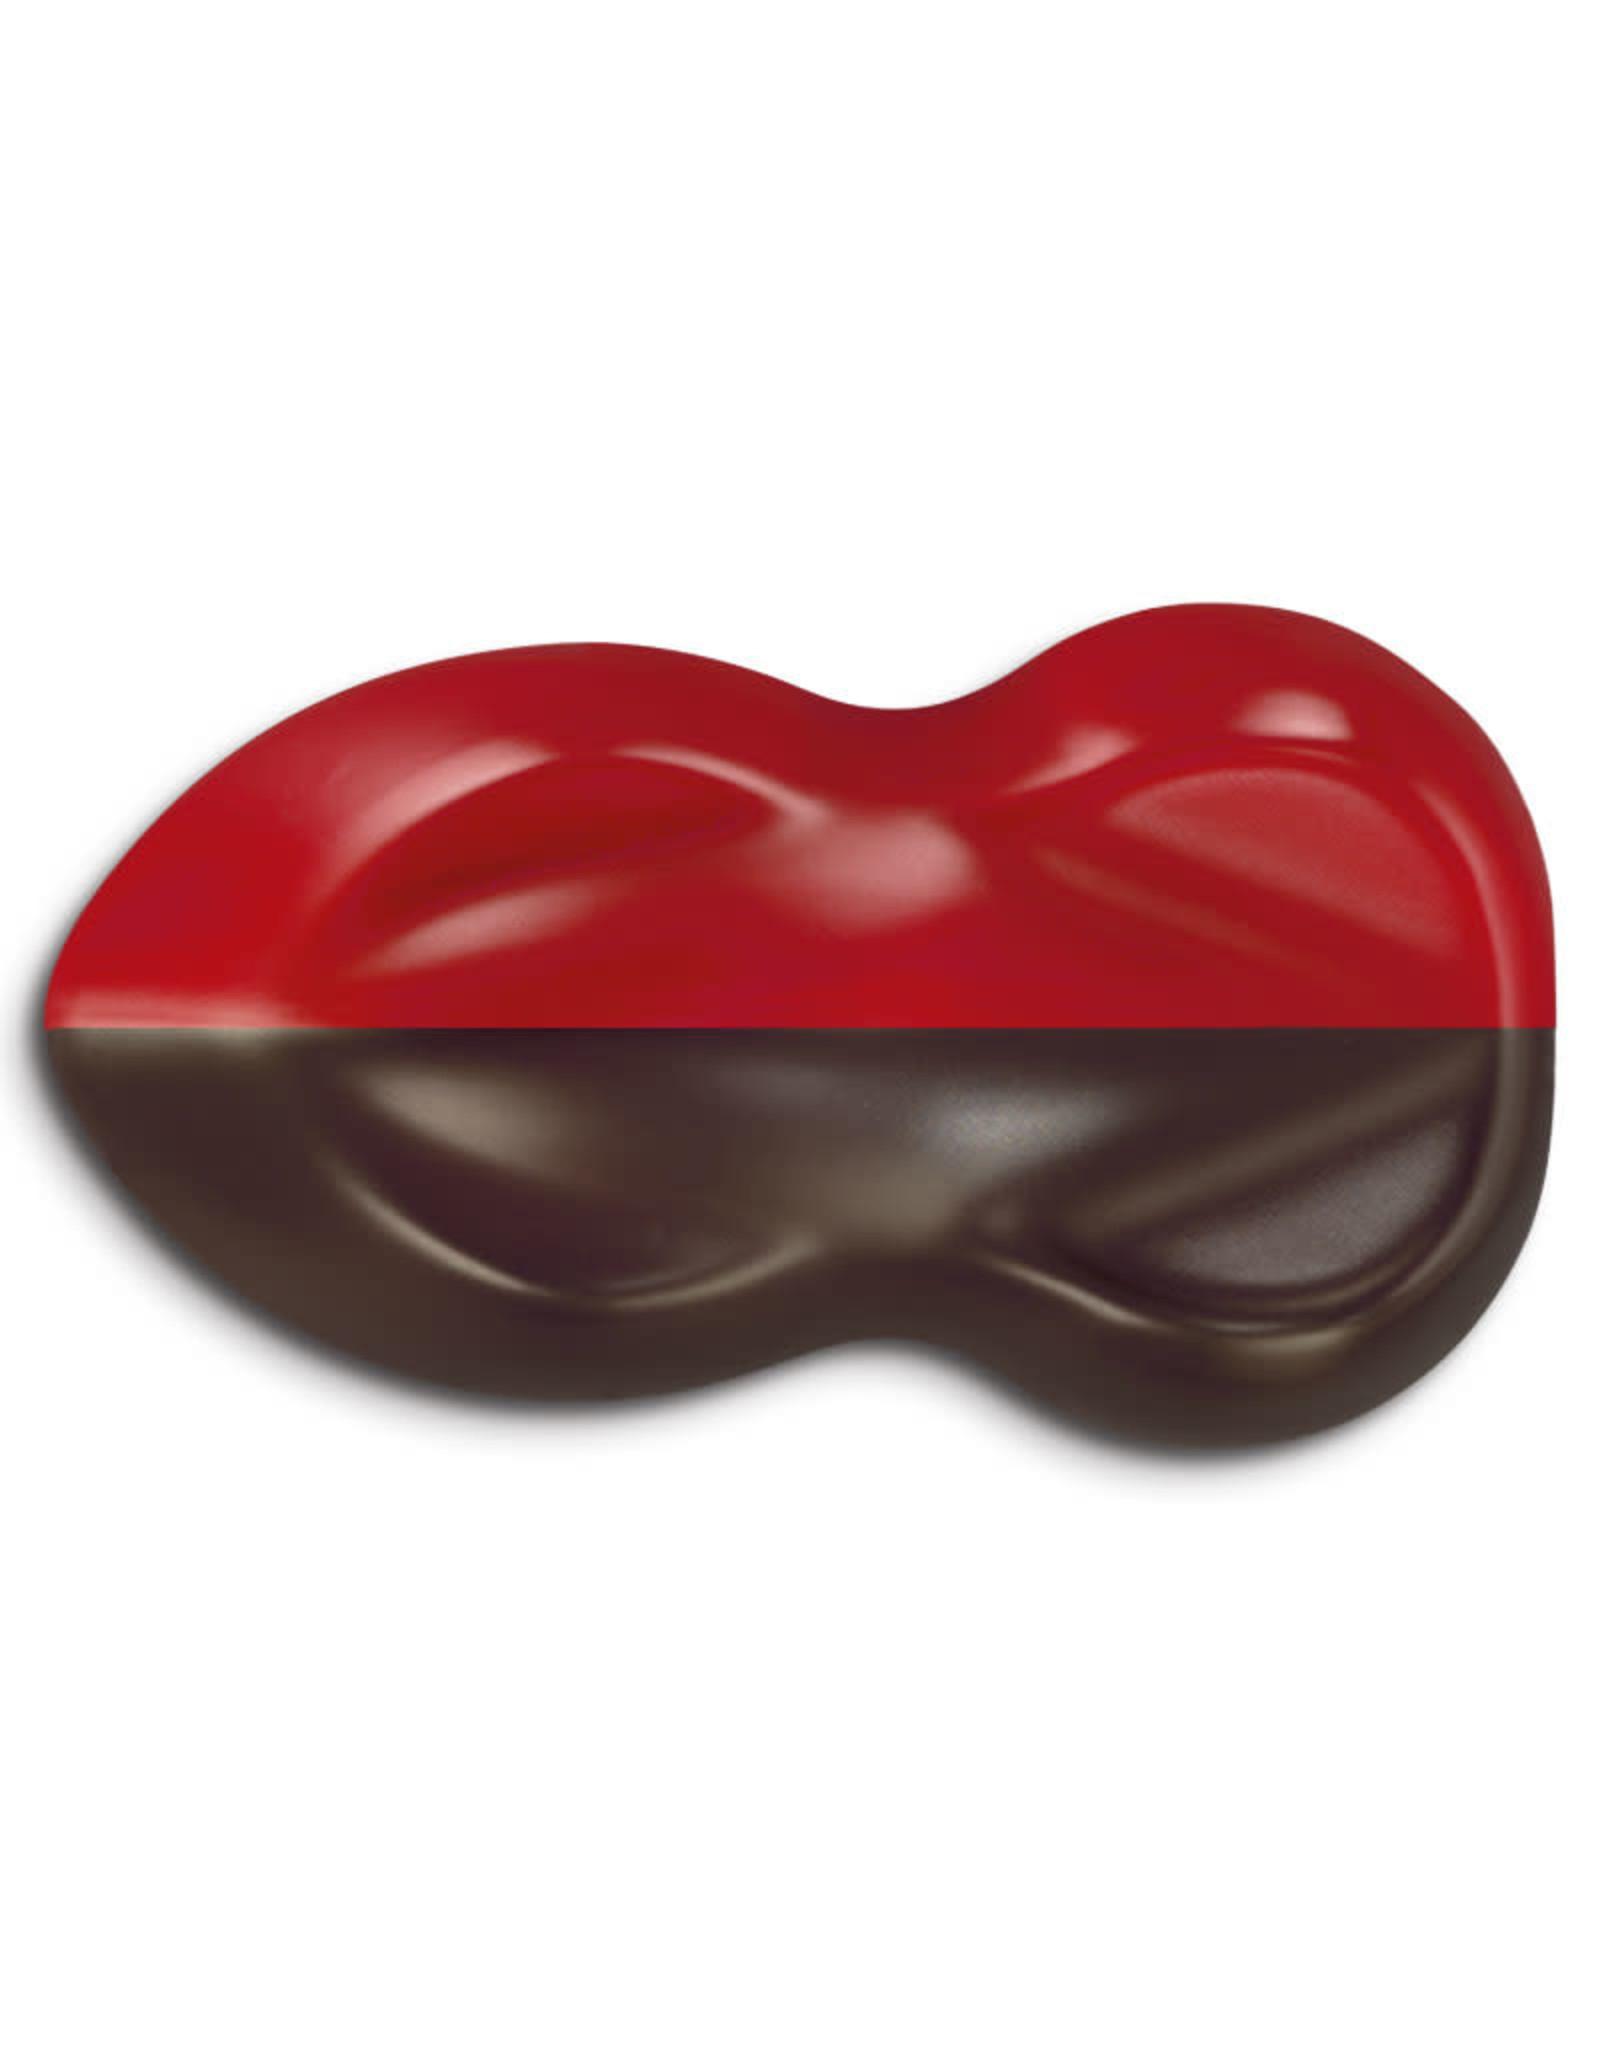 Schmincke Schmincke AERO Color Standard Colours 28 ml - 28301 Red Madder Dark